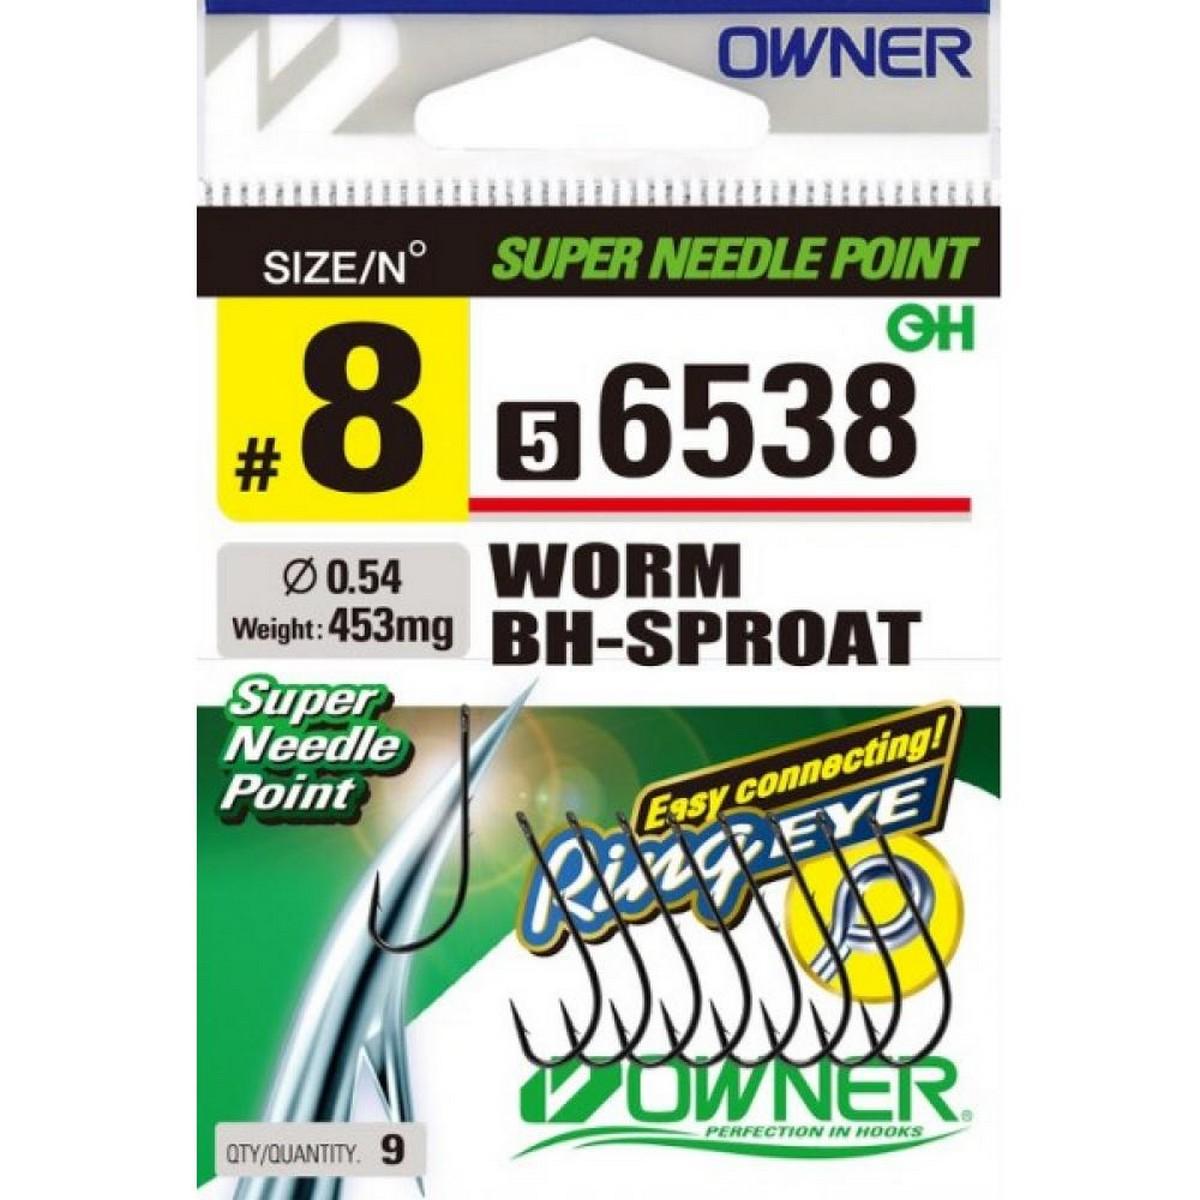 Куки Owner Worm BH Sproat 56538